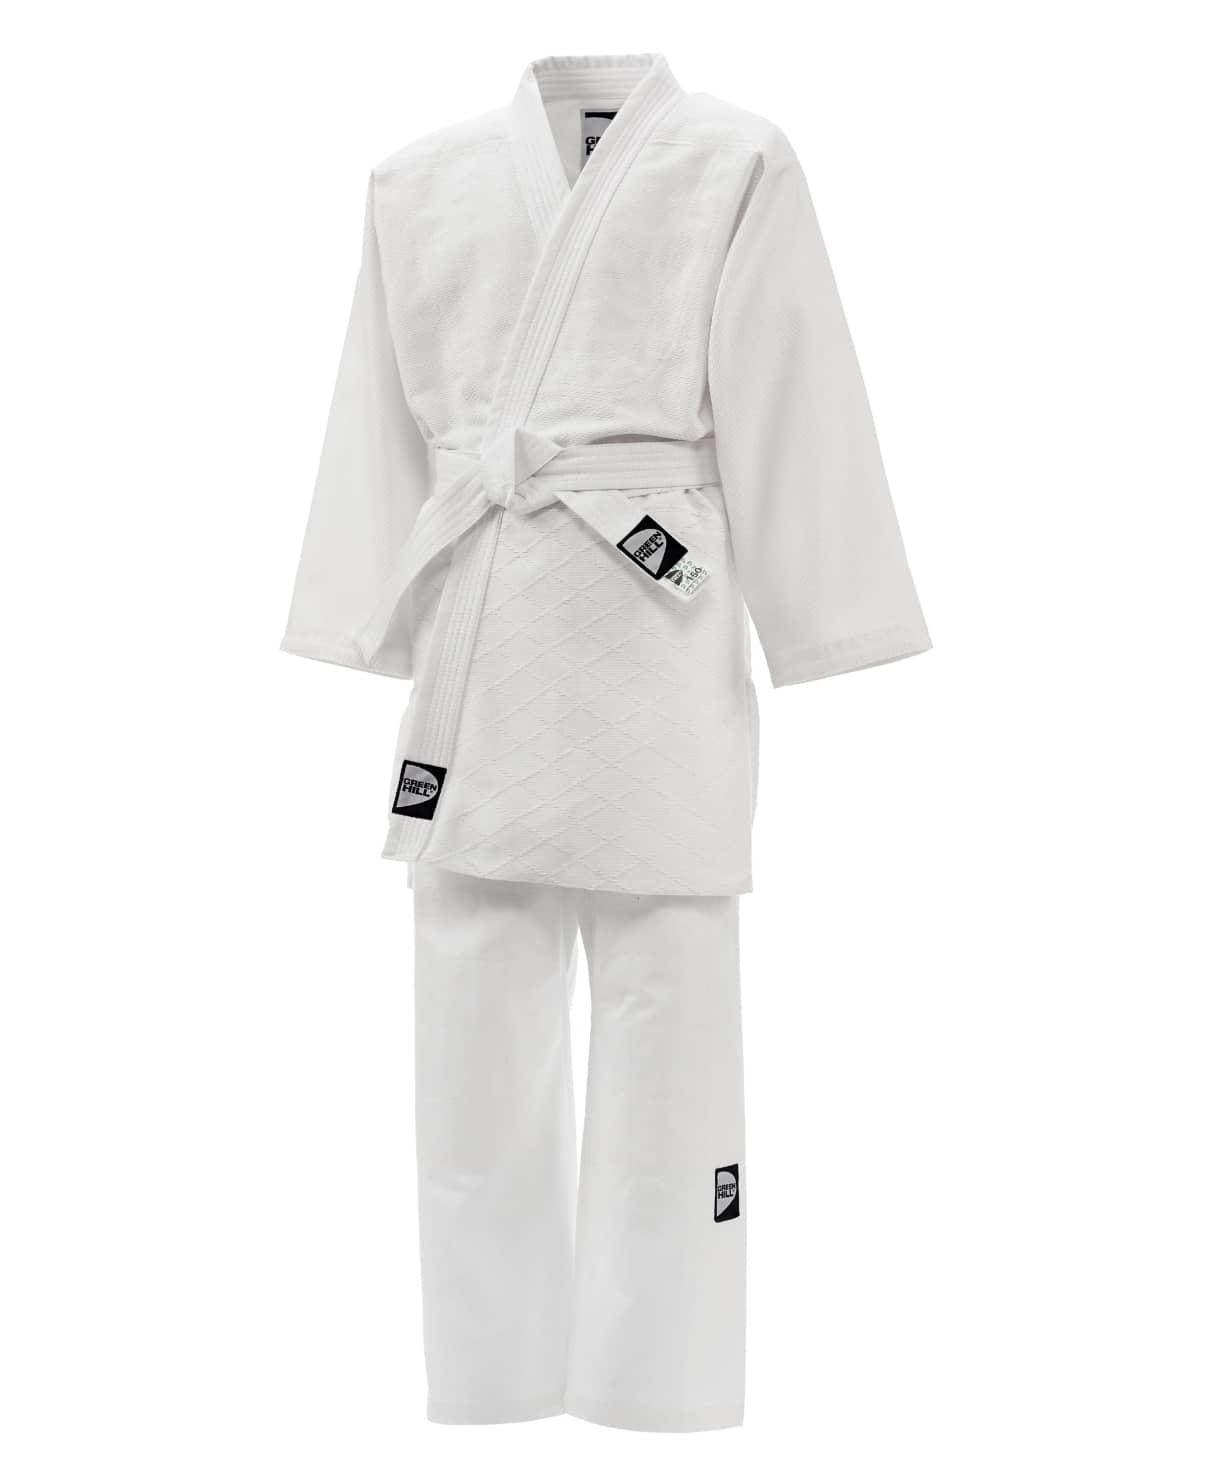 Кимоно для дзюдо JSST-10572, белый, р.00/120